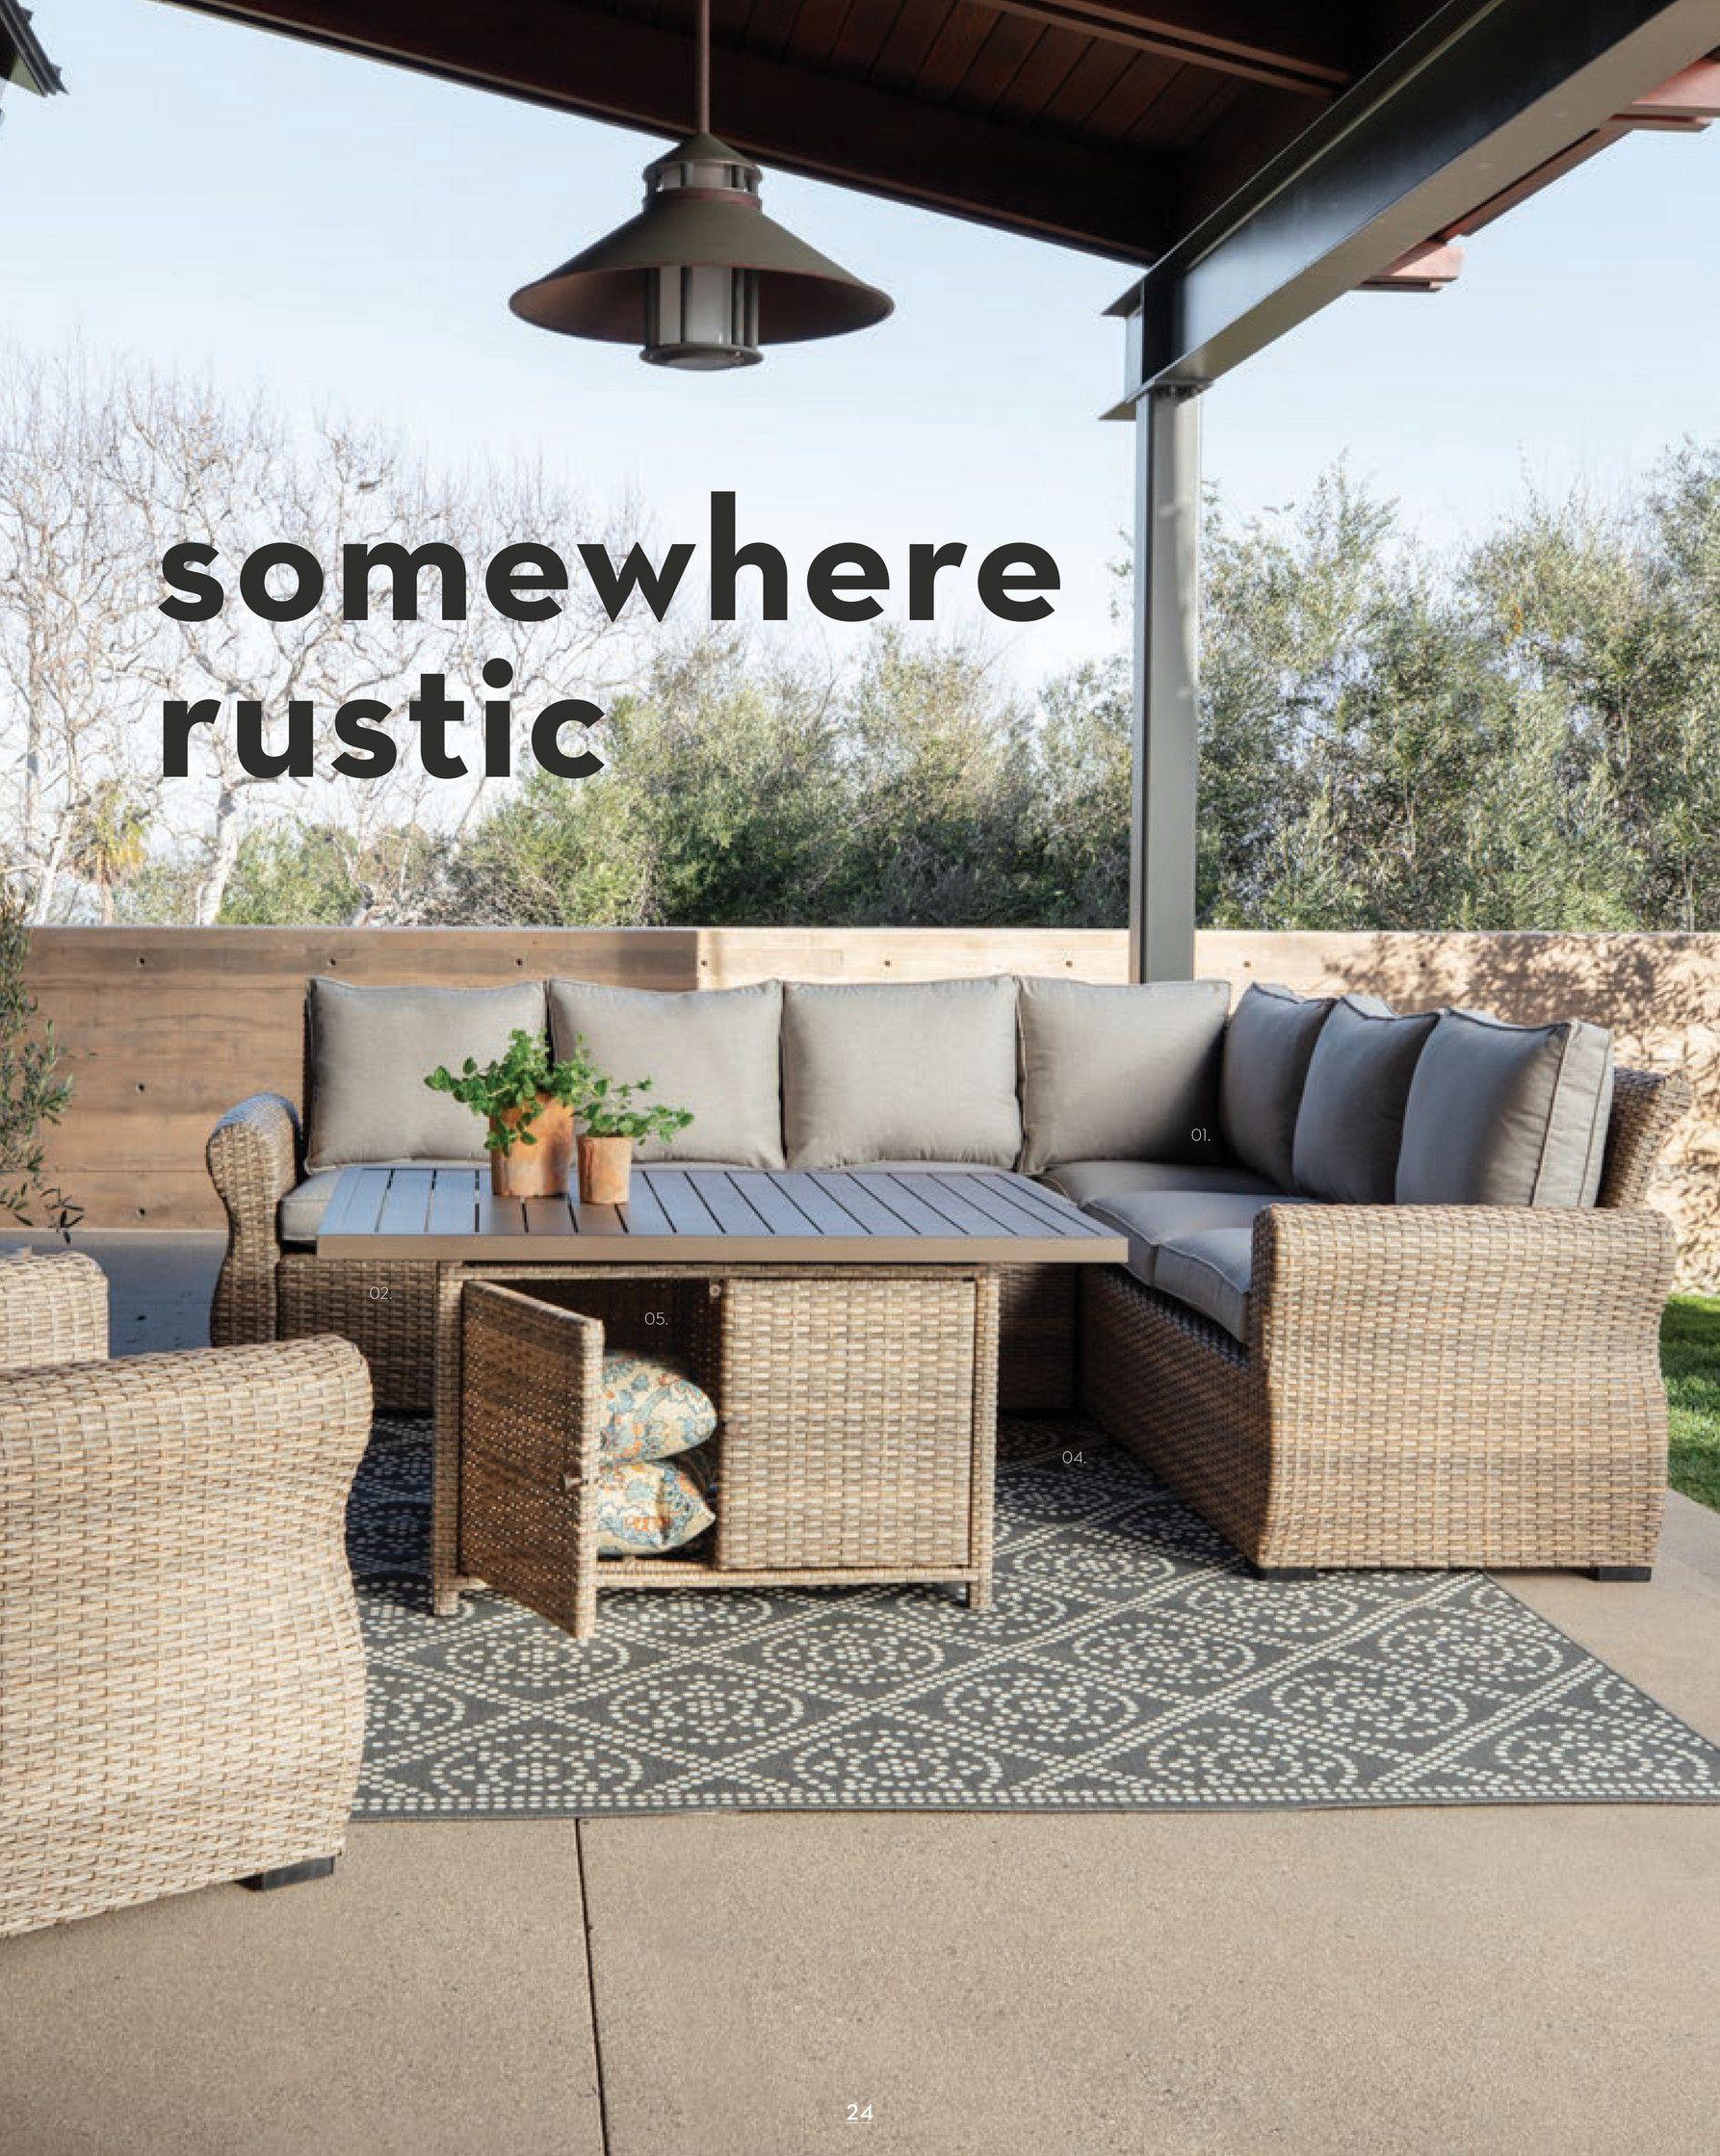 Living Spaces - Outdoor 2019 - Outdoor Malta Banquette ... on Living Spaces Outdoor Daybed id=44534